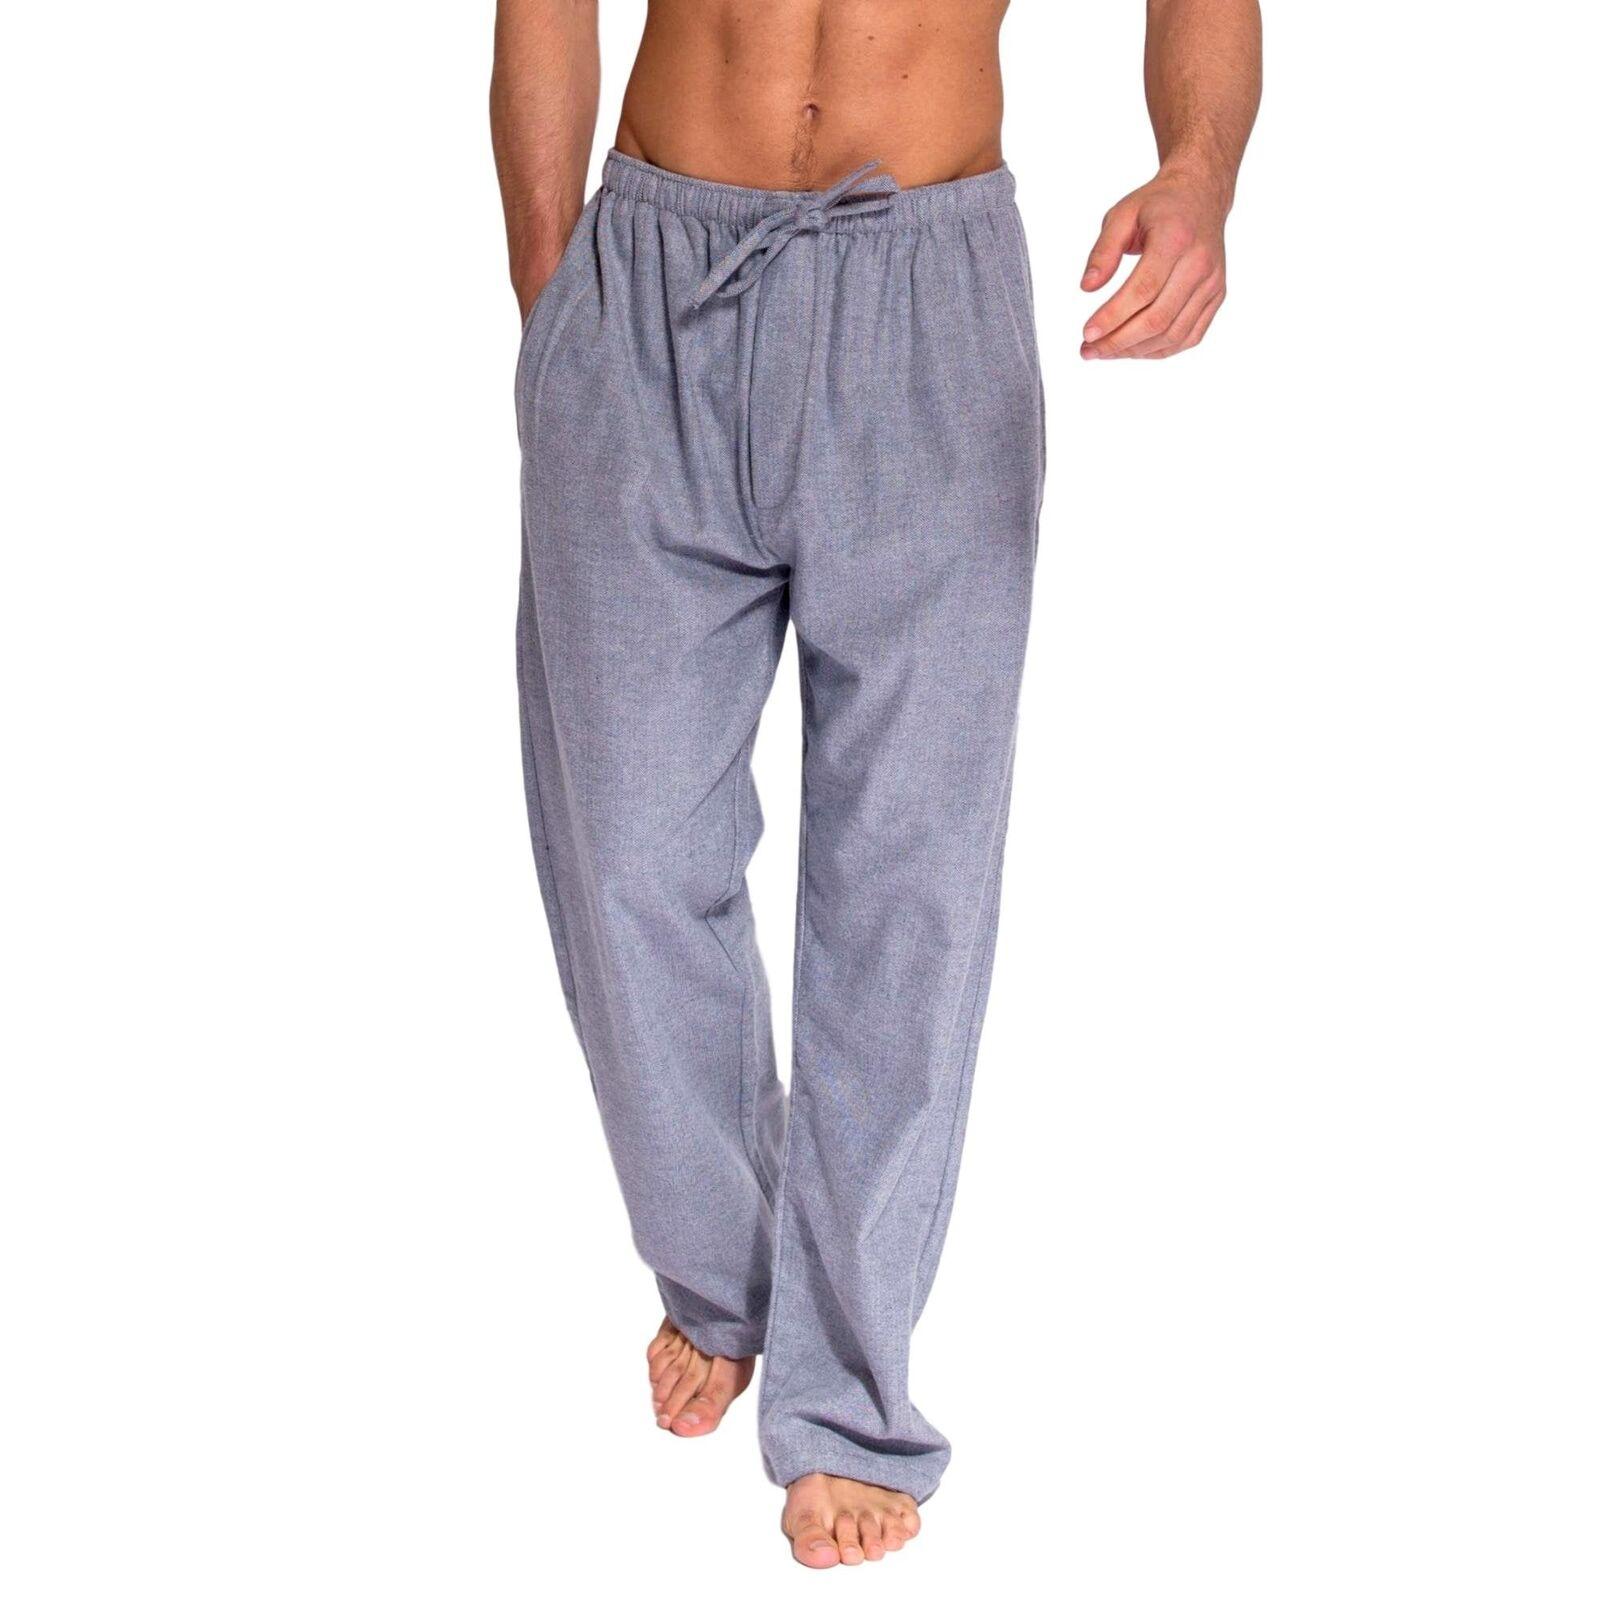 British Boxers Men's Ash Grey Herringbone Two-Fold Flannel Pyjama Trouser